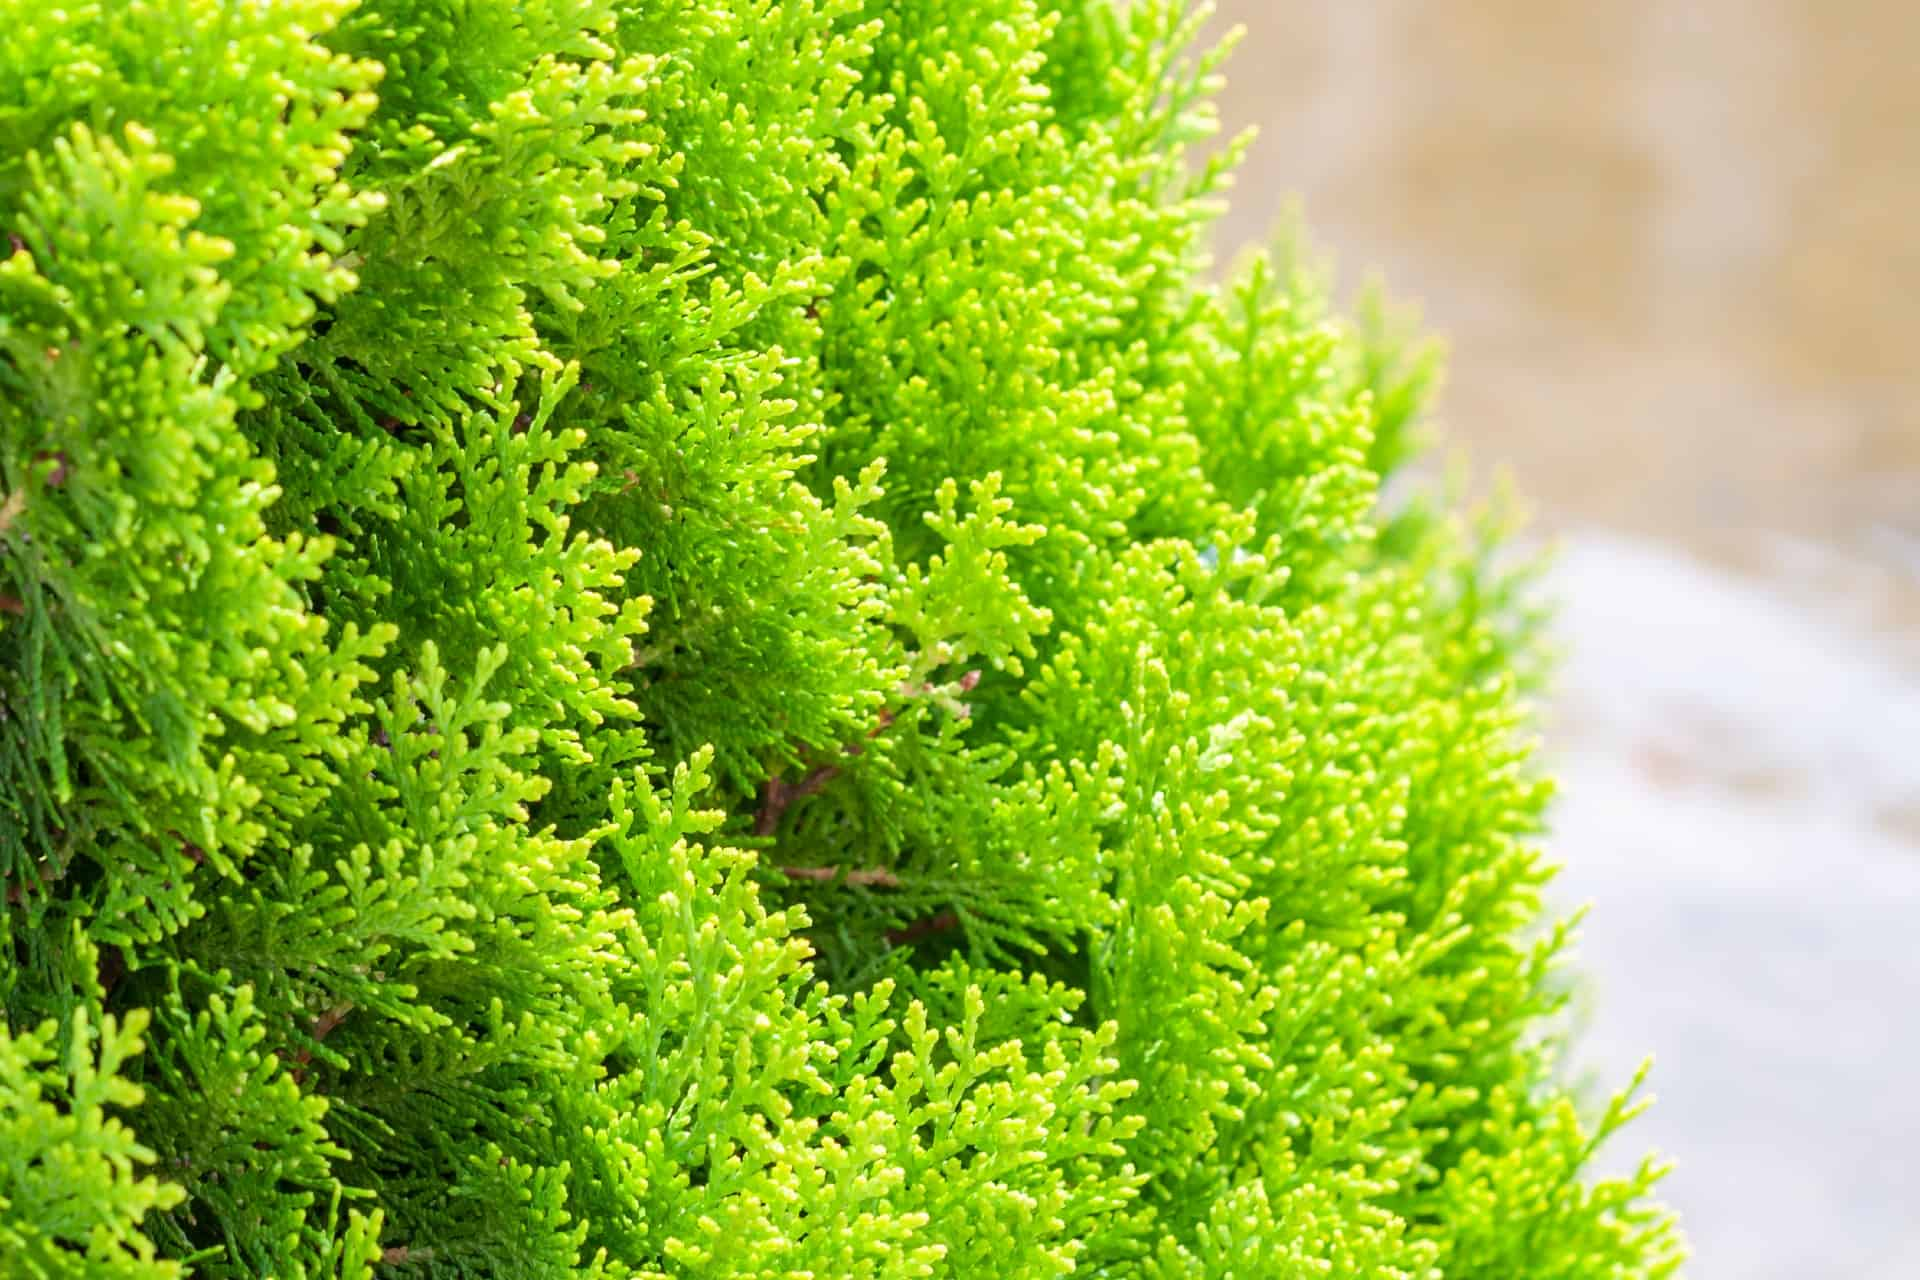 The American arborvitae is a popular evergreen shrub.